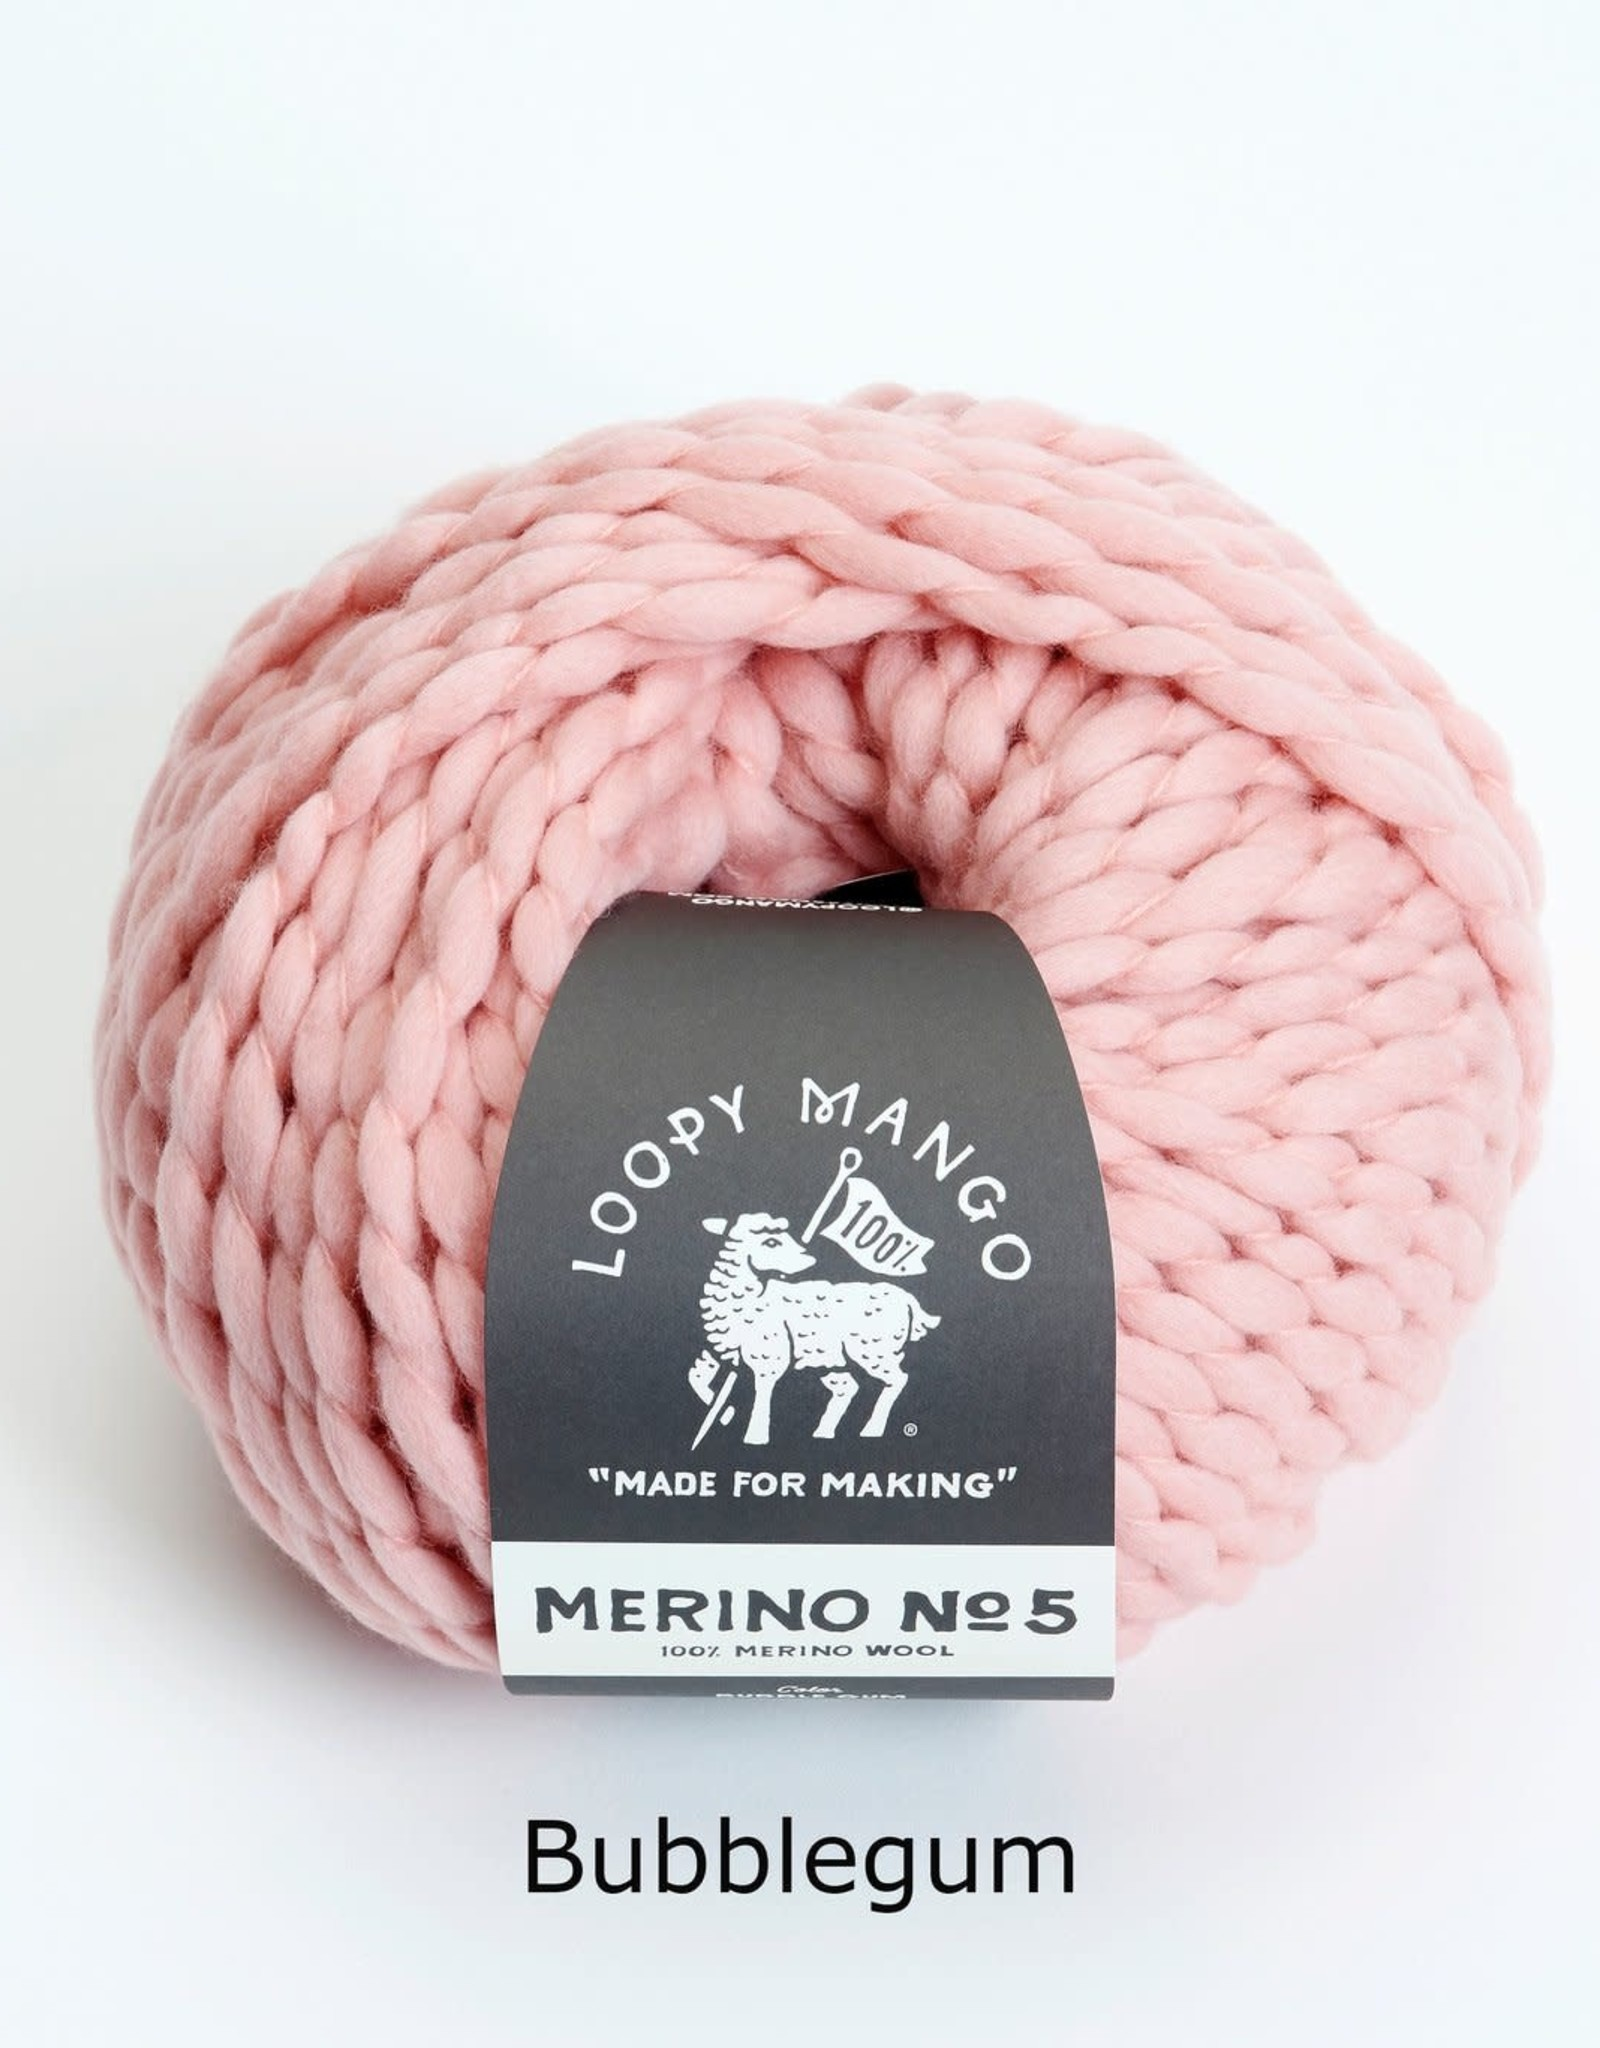 Loopy Mango Merino No. 5 by Loopy Mango